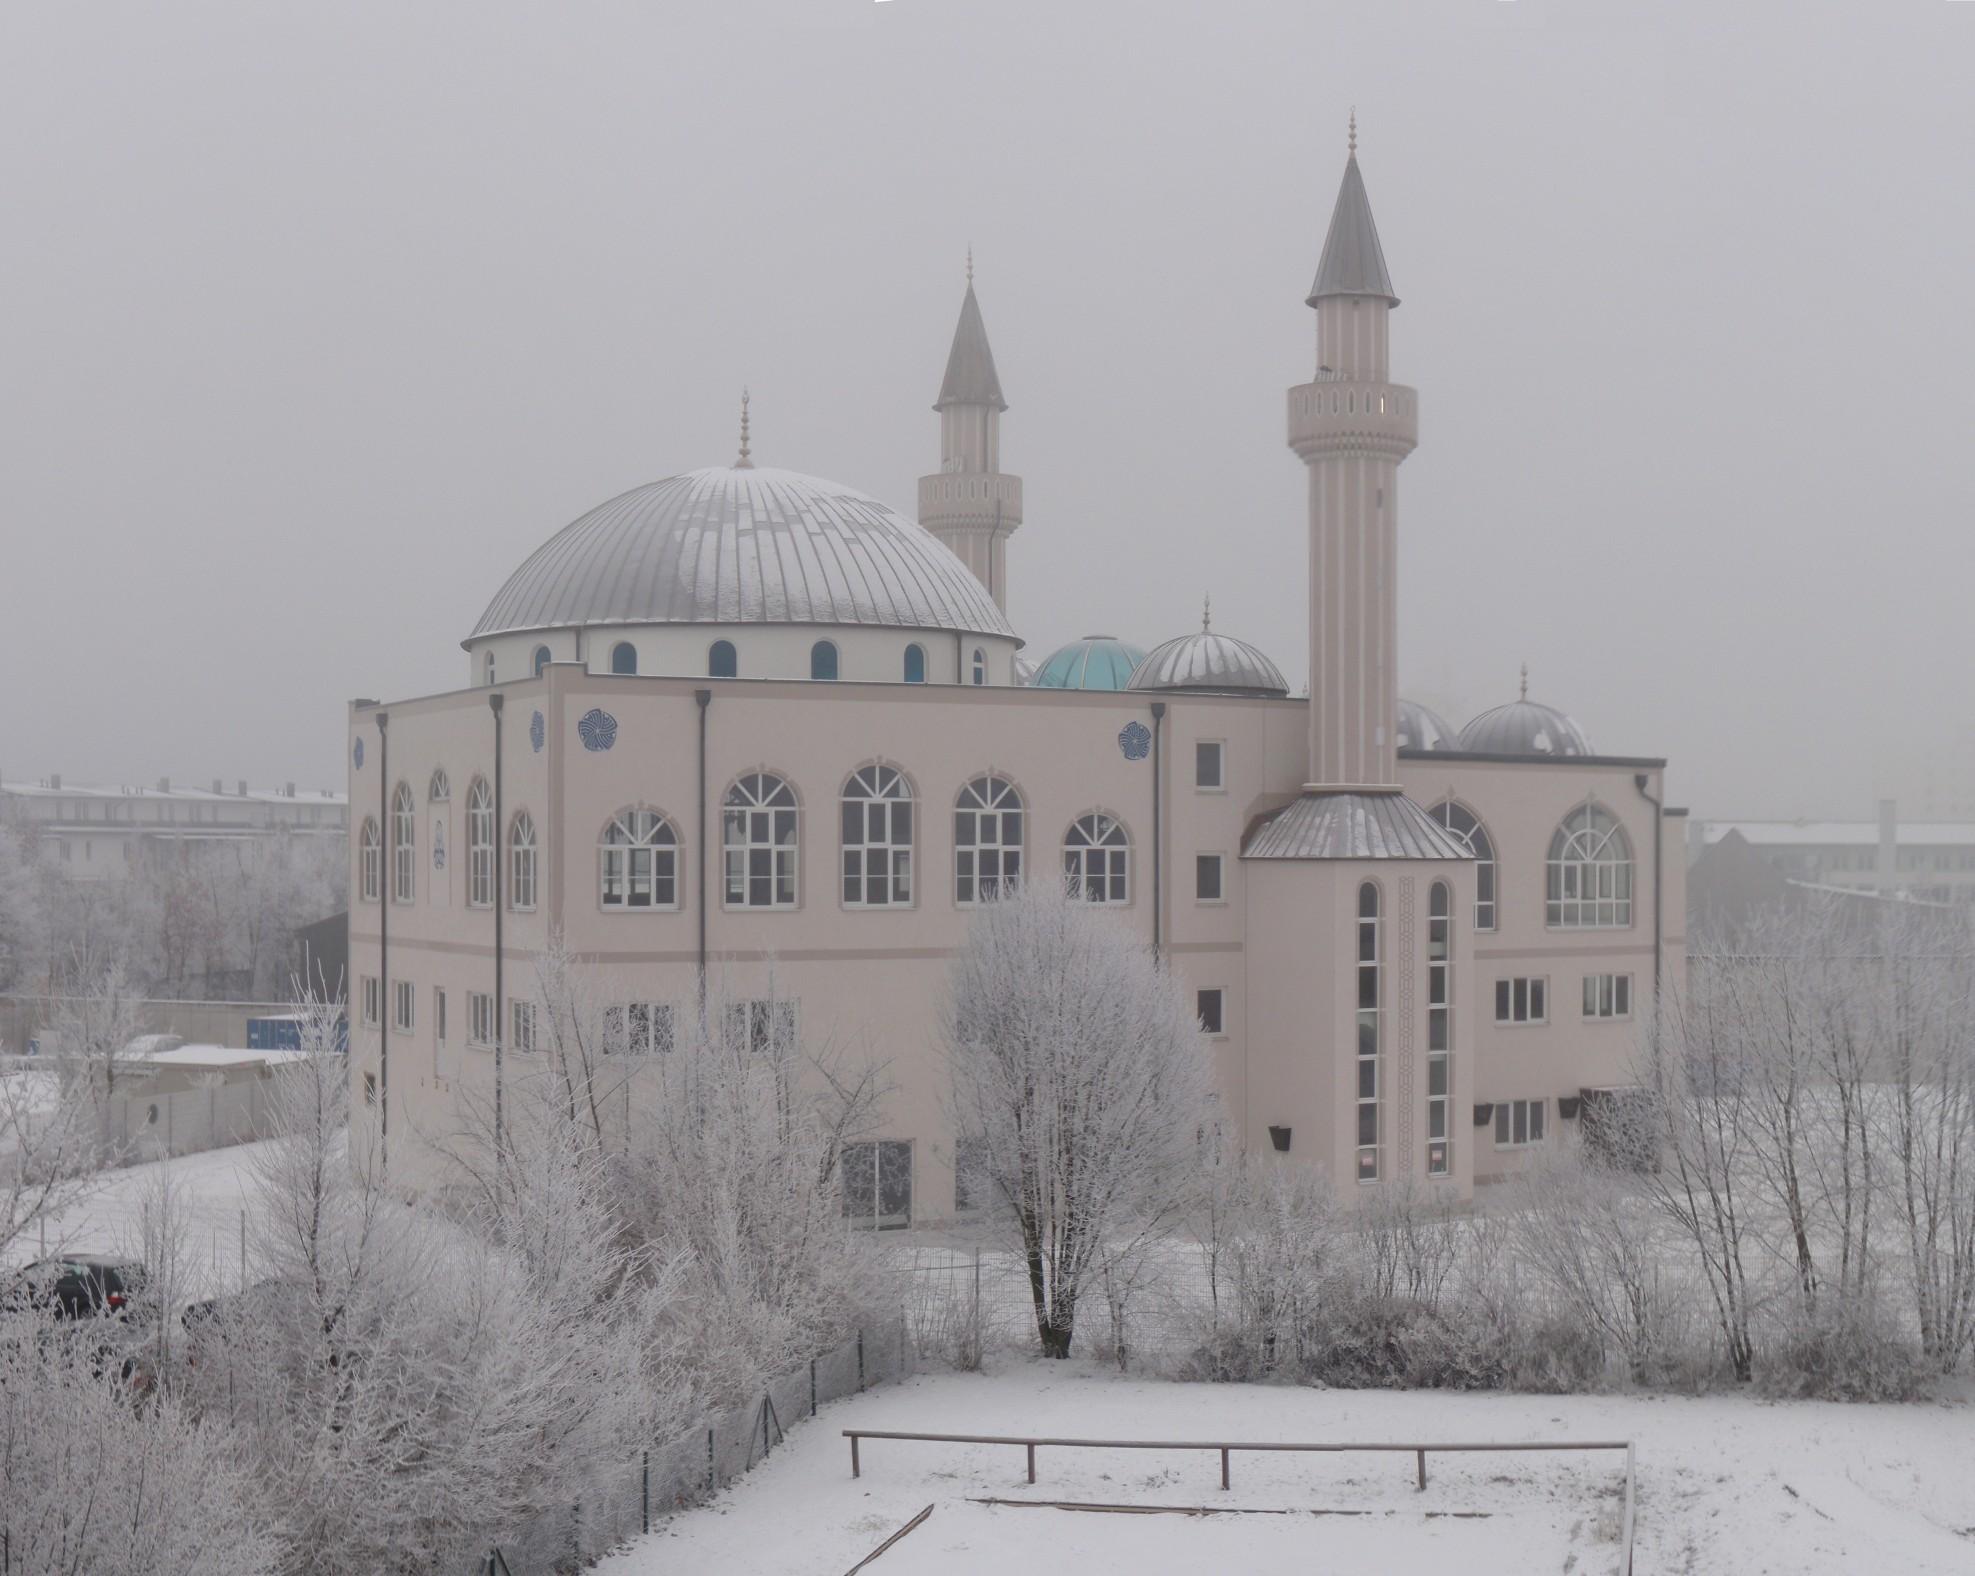 File Kocatepe Moschee Ingolstadt 16 01 2009 Jpg Wikimedia Commons